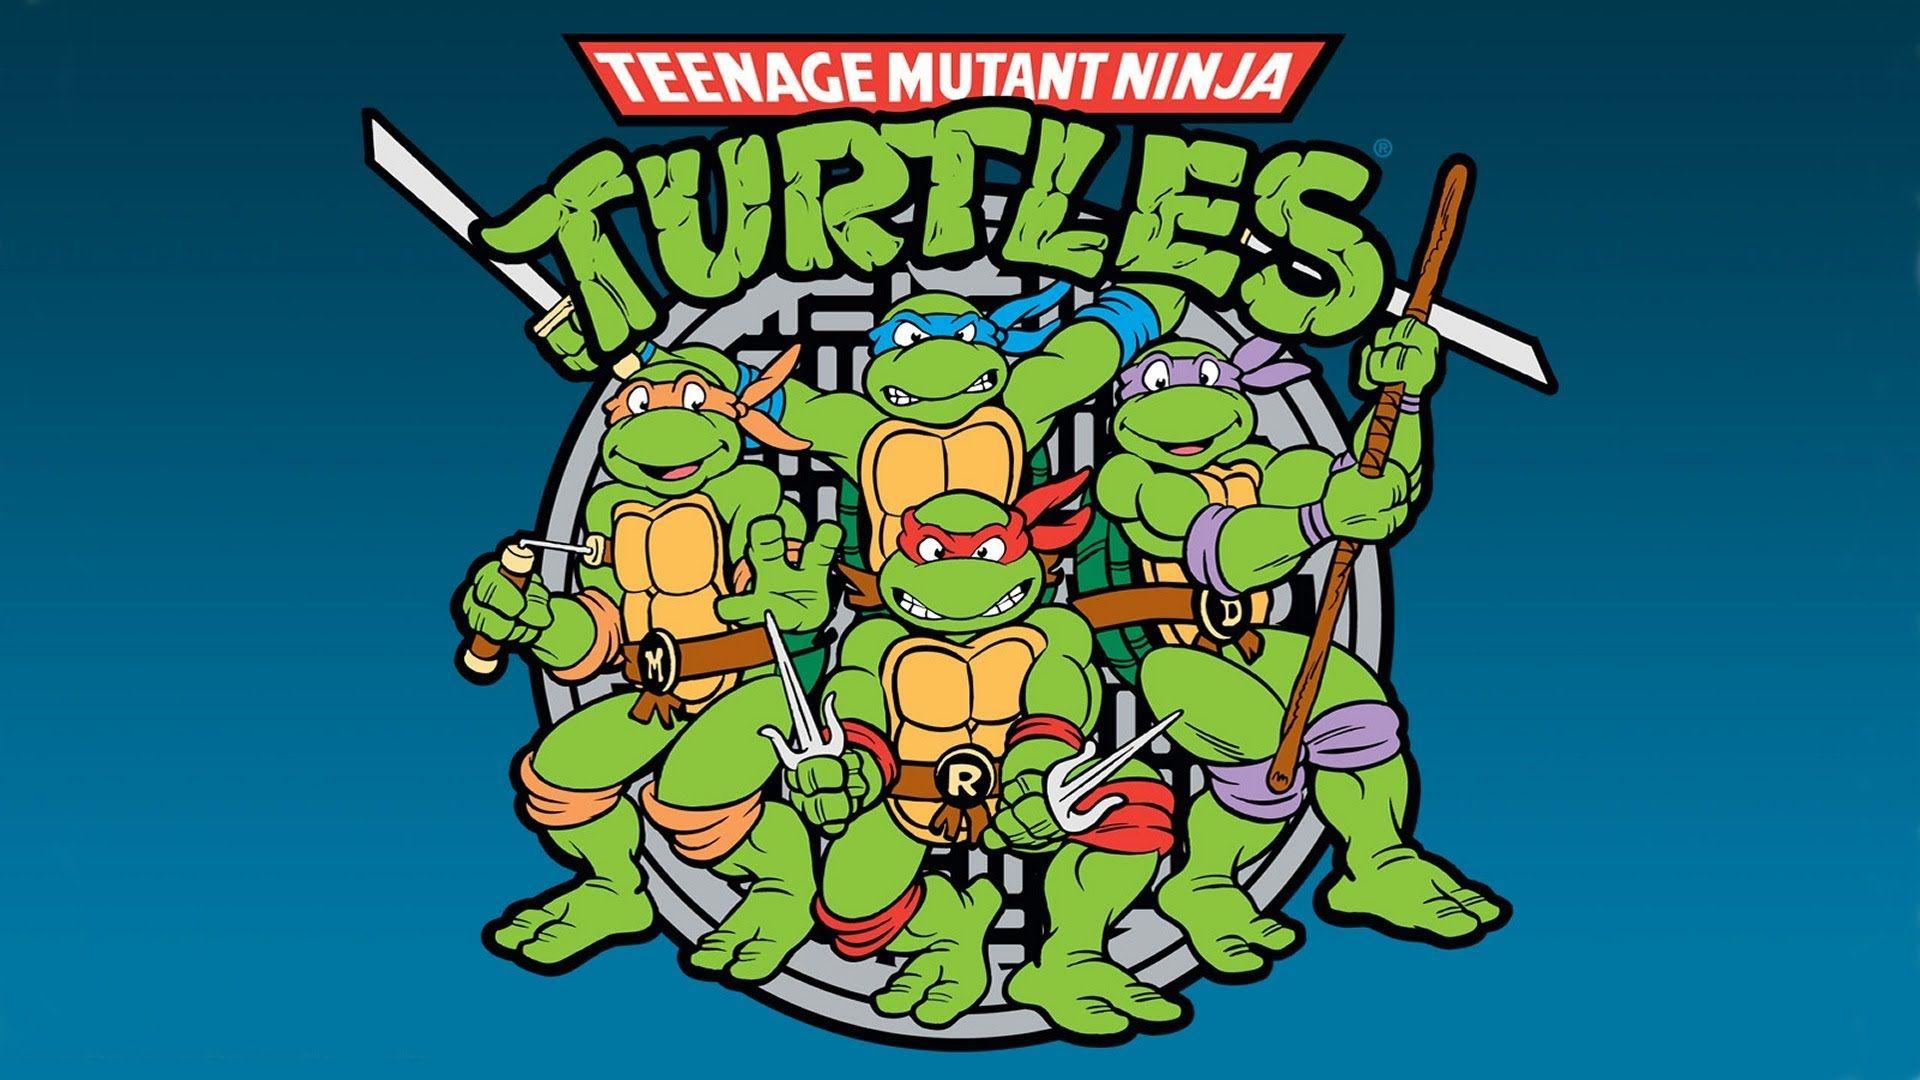 Te Teenage Mutant Ninja Turtles Tv Show - Free tmnt vector art google search